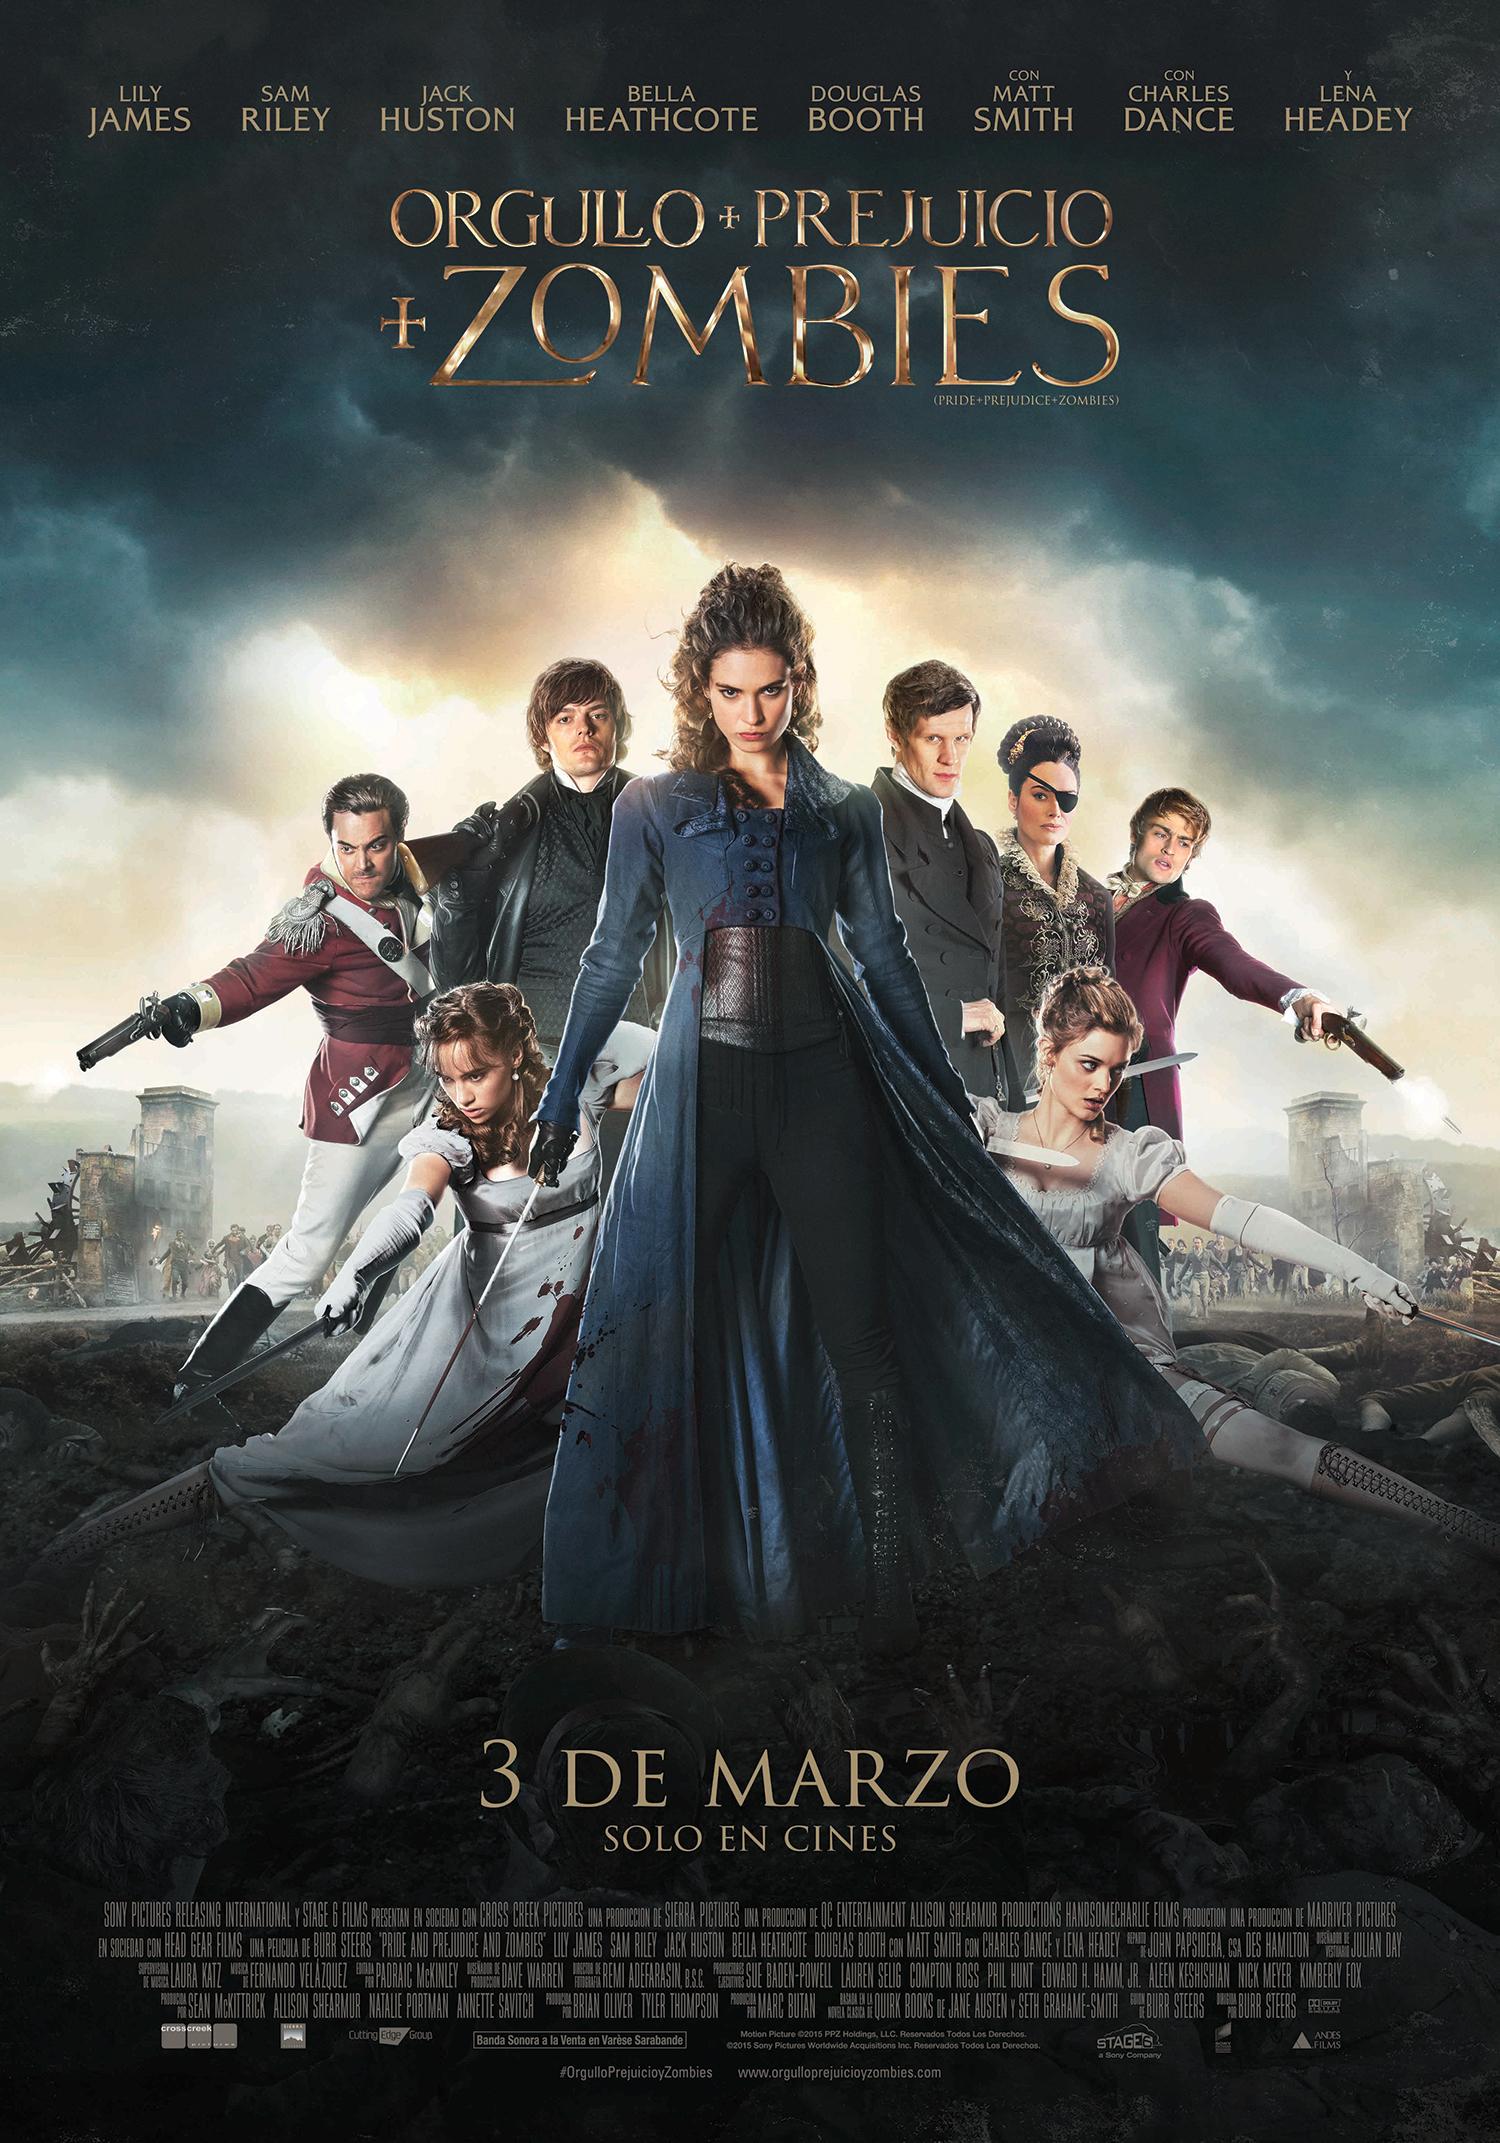 http://www.andesfilms.com.pe/orgullo-prejuicio-zombies/